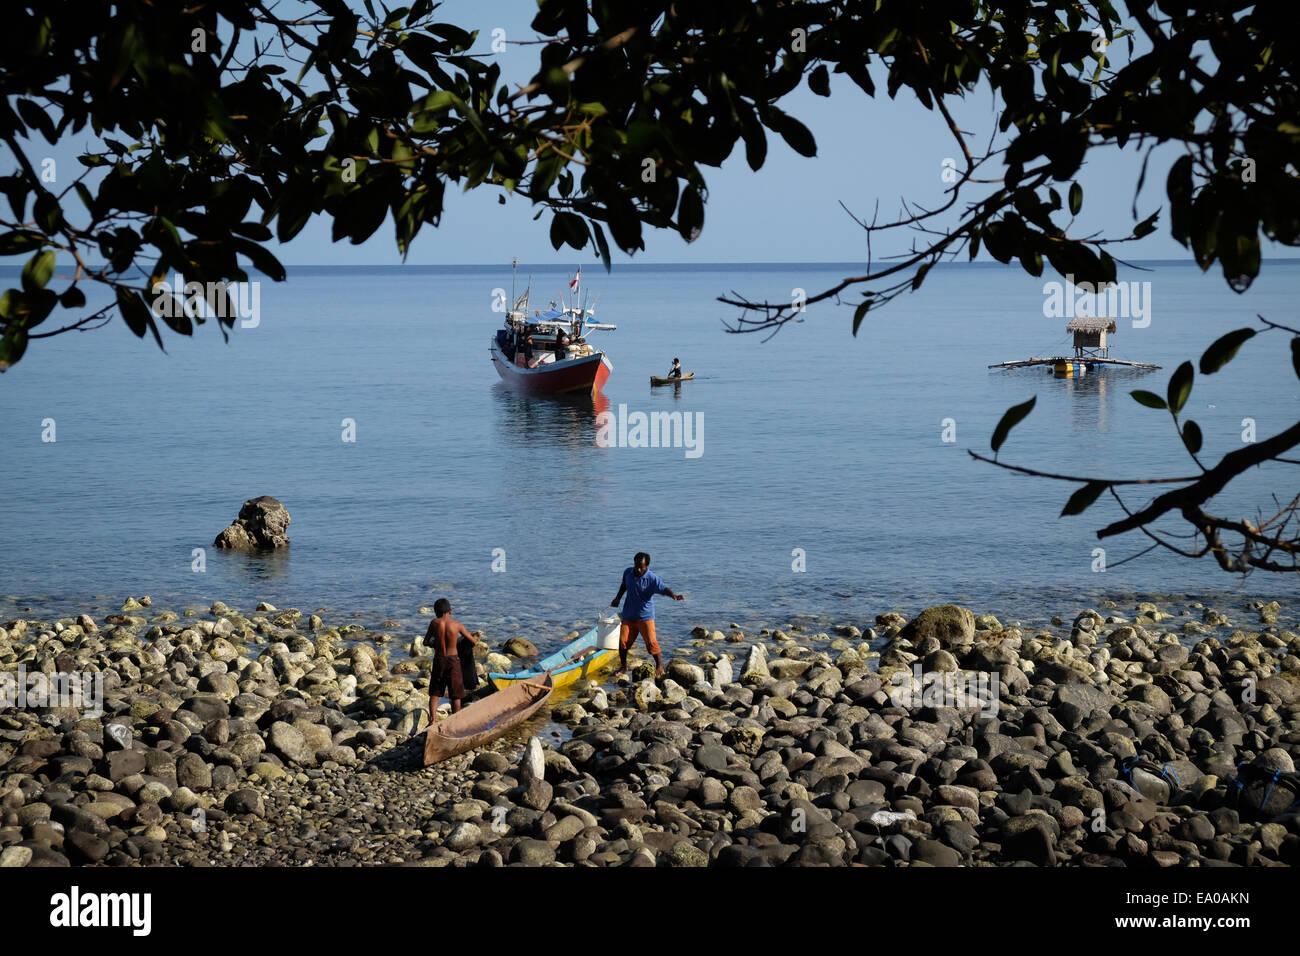 Fishermen of Lamagute village, Lembata Island, East Nusa Tenggara province, Indonesia. - Stock Image